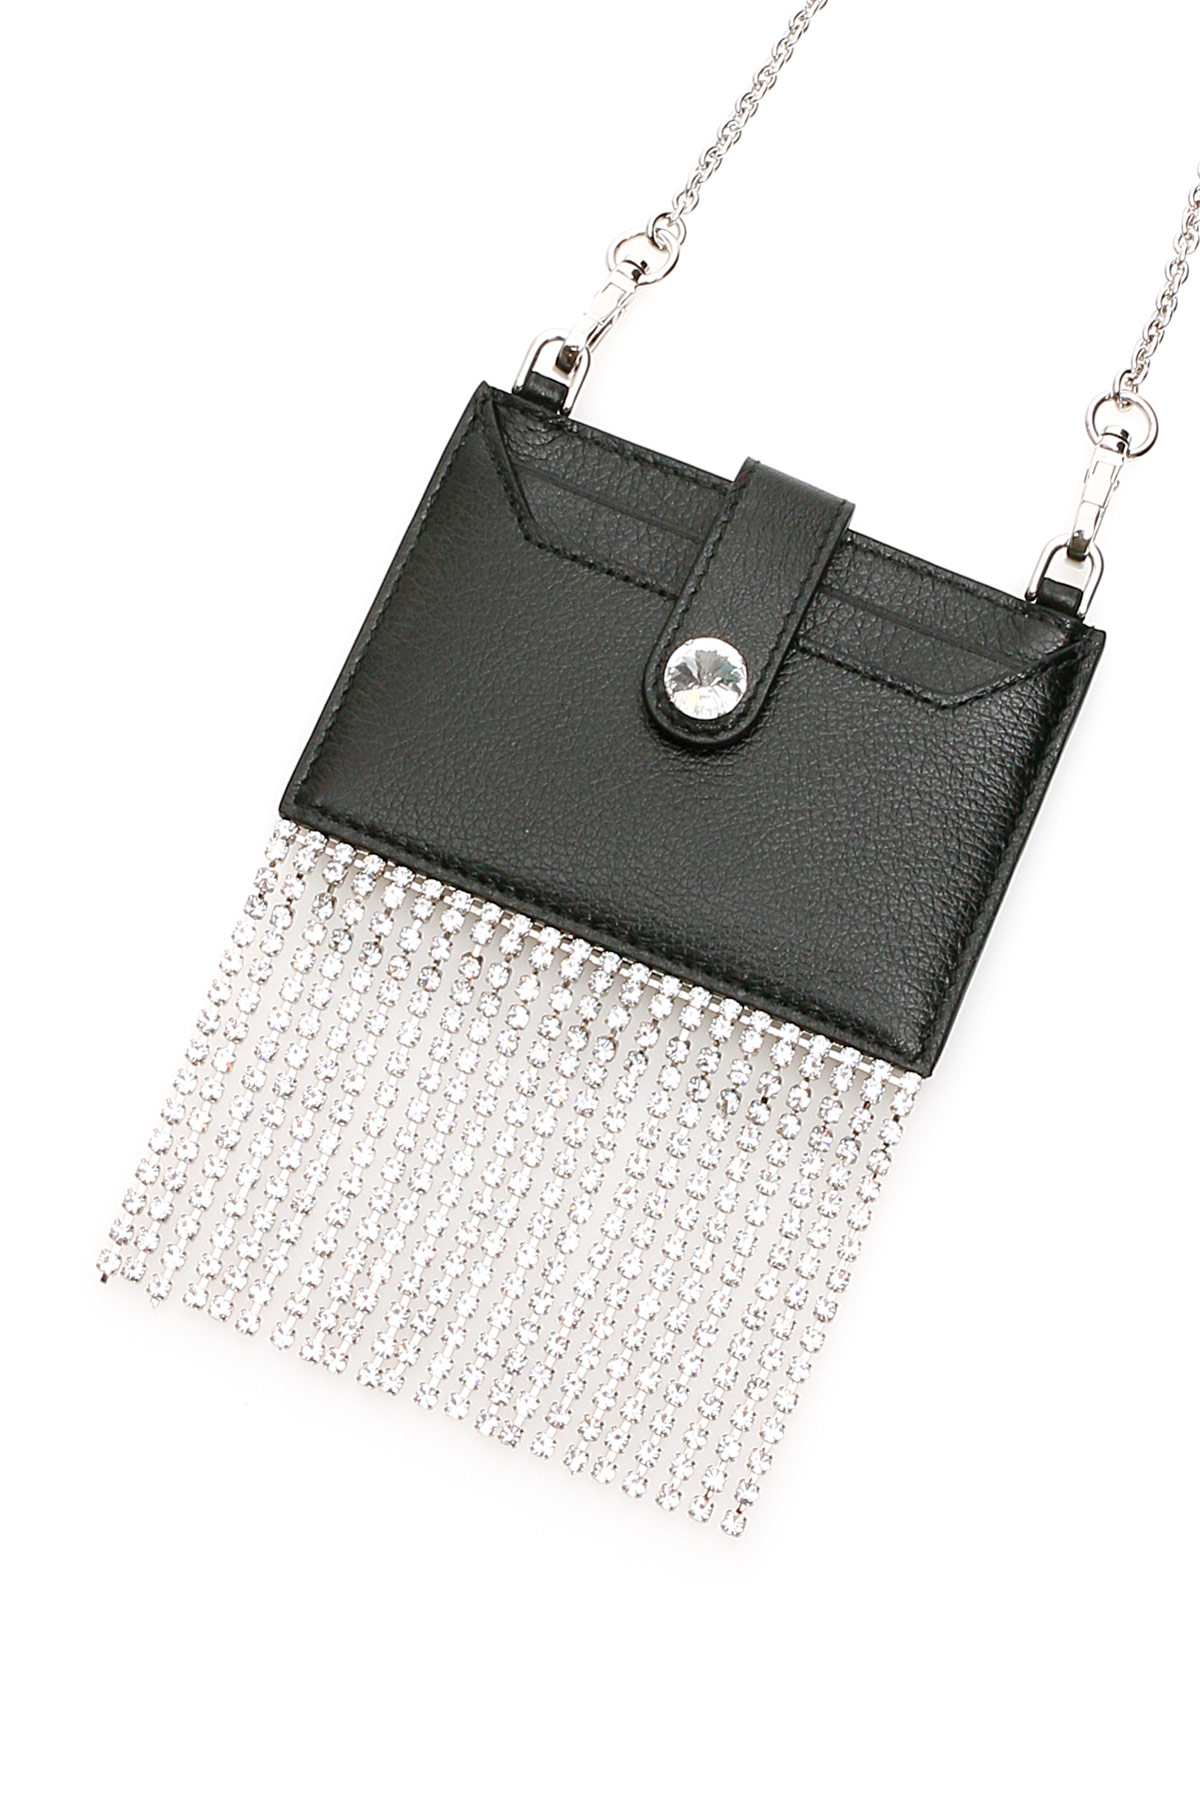 Miu miu portacarte crystal fringes con catena